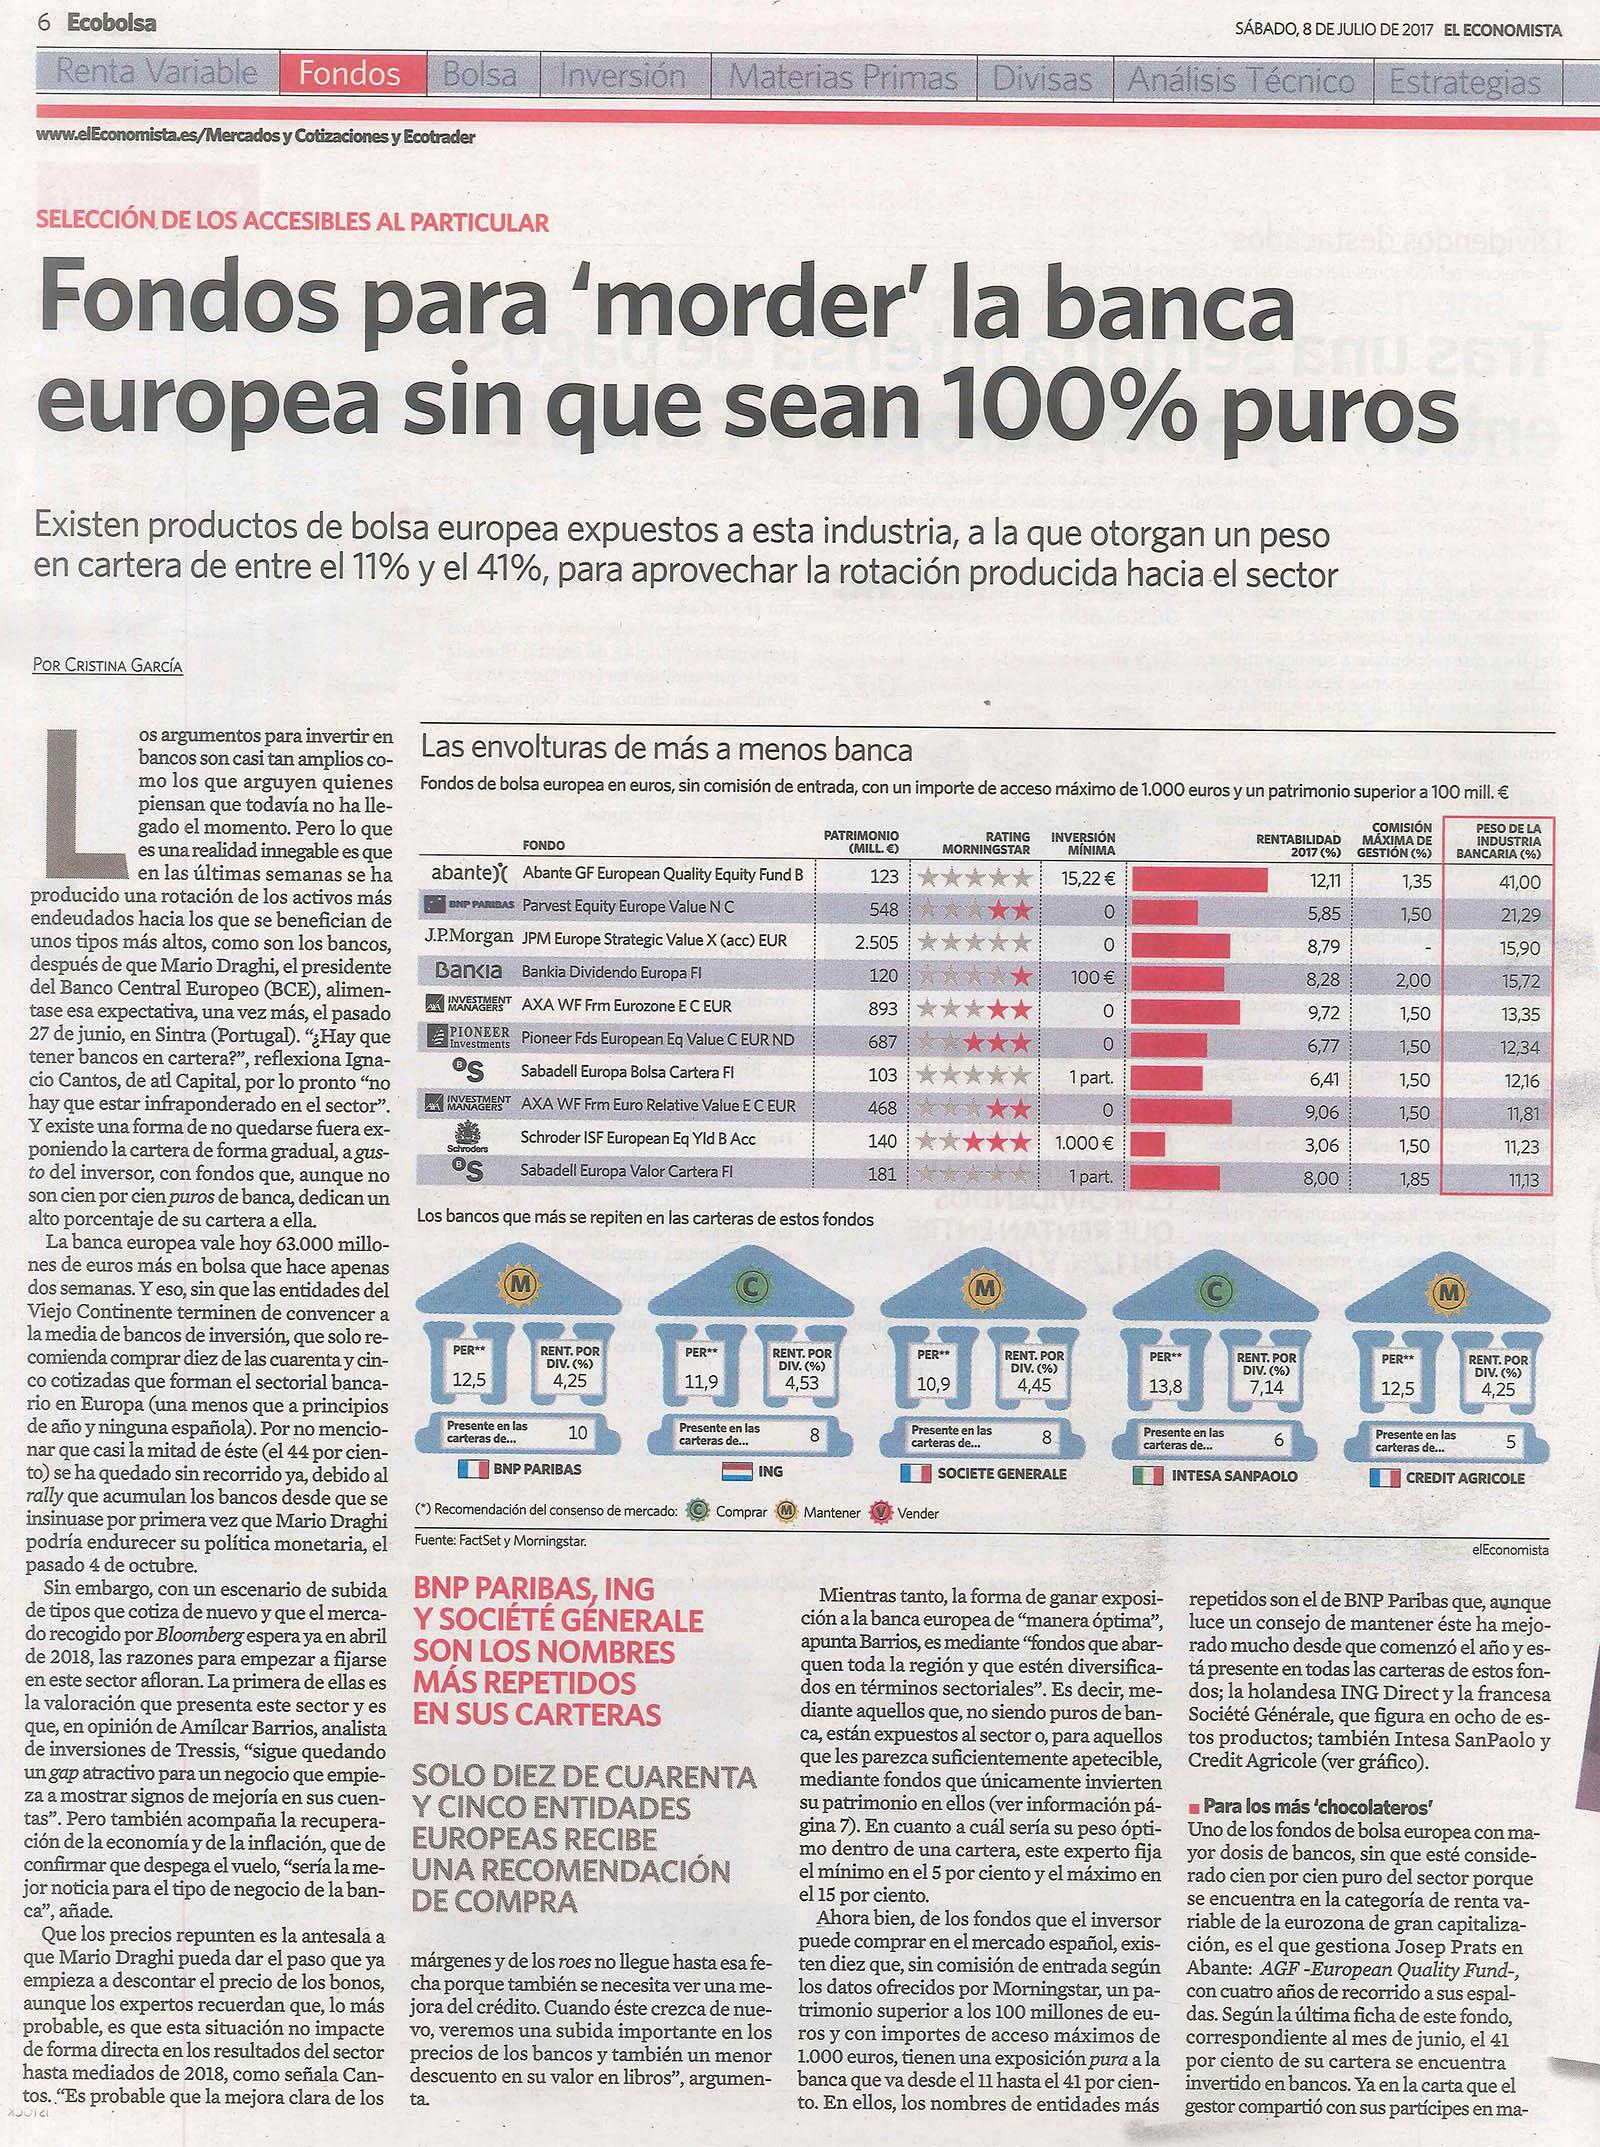 20170710 El Economista Josep Prats European fondos banca 1